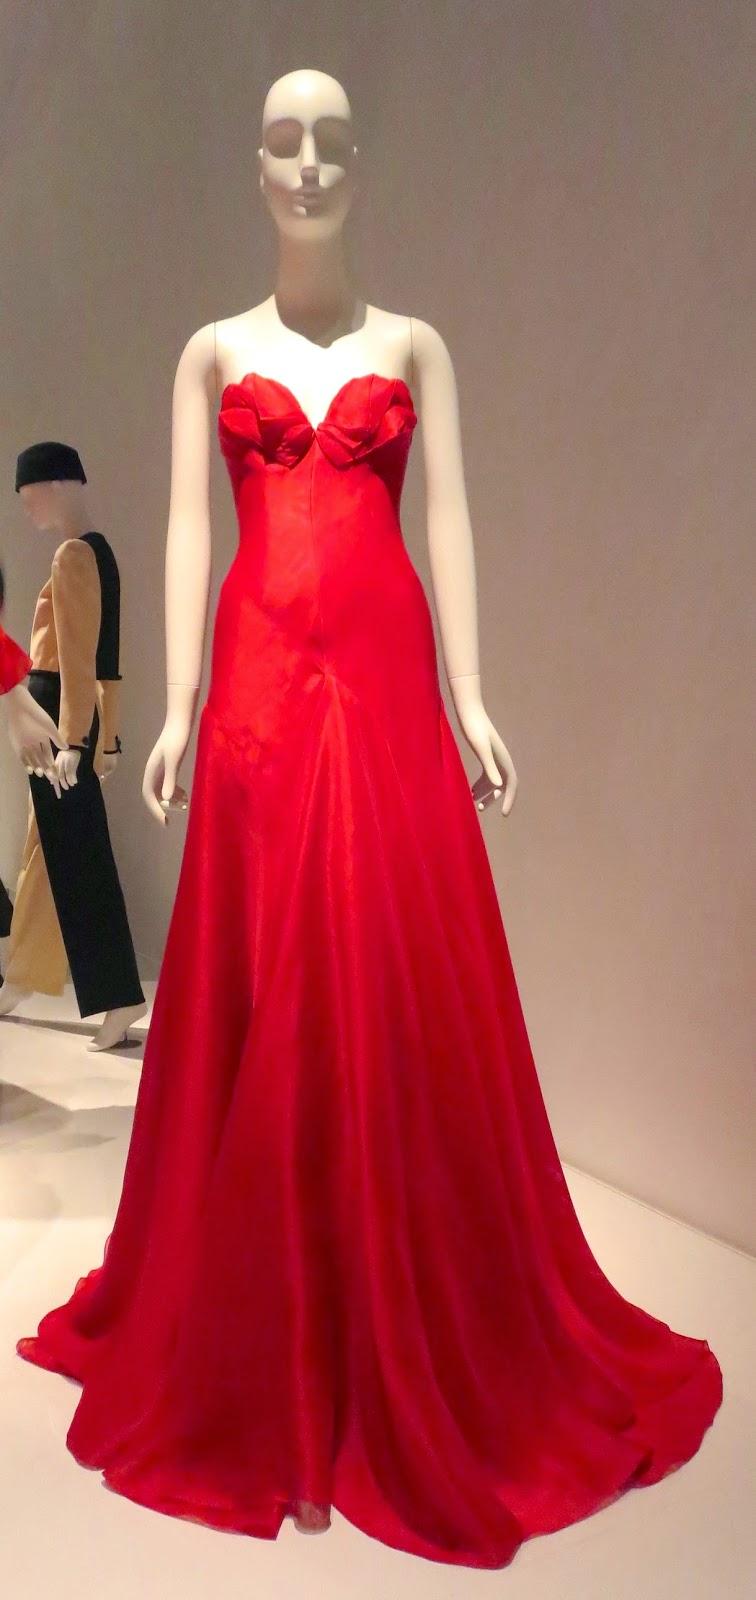 Idiosyncratic Fashionistas: Yves Saint Laurent + Halston: Fashioning ...